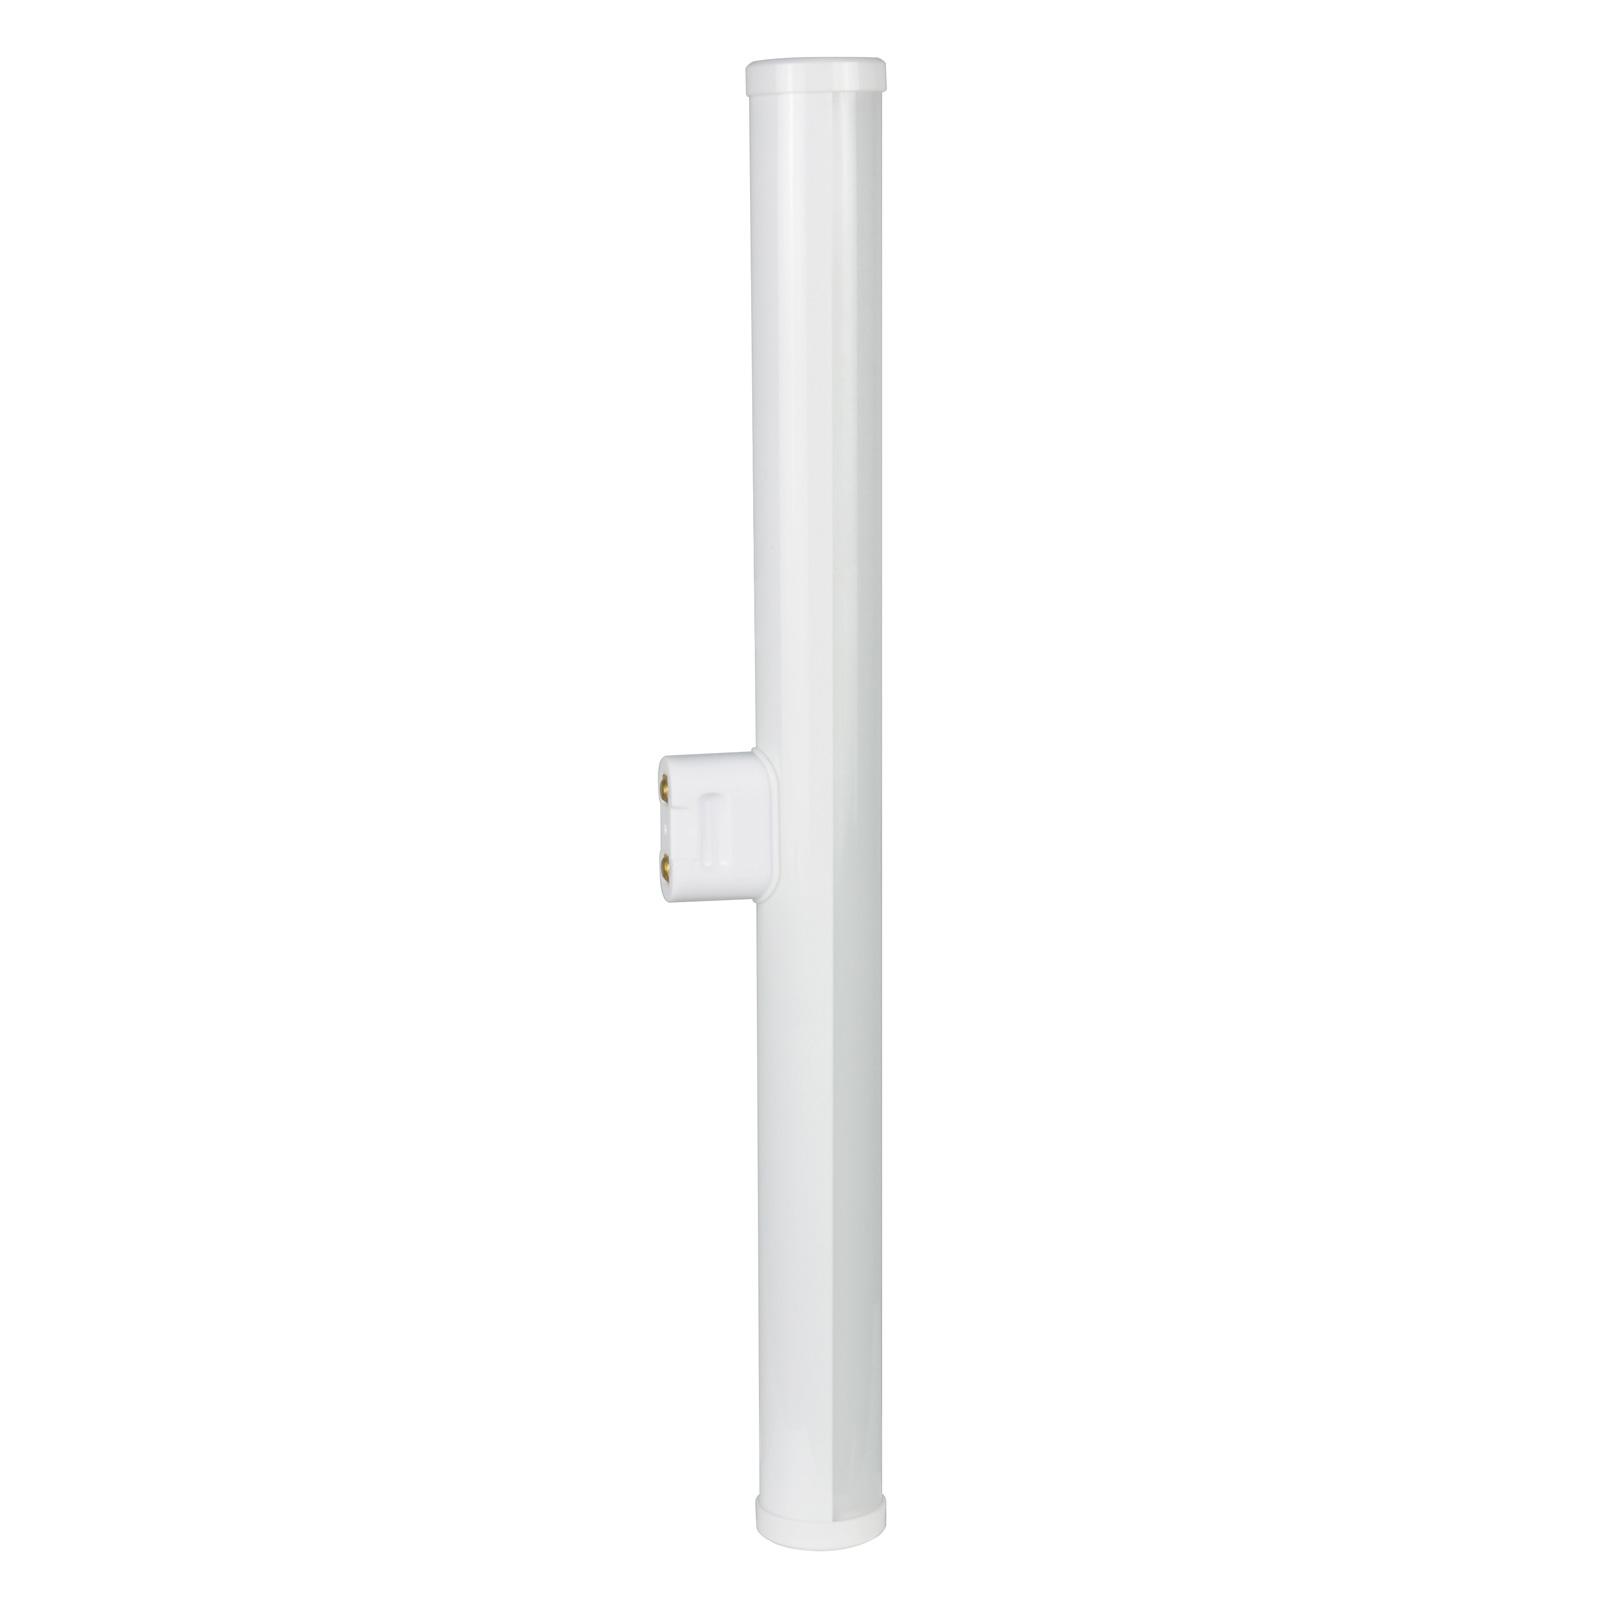 LED-Linienlampe S14d 3,5W 827  1-Sockel 300mm